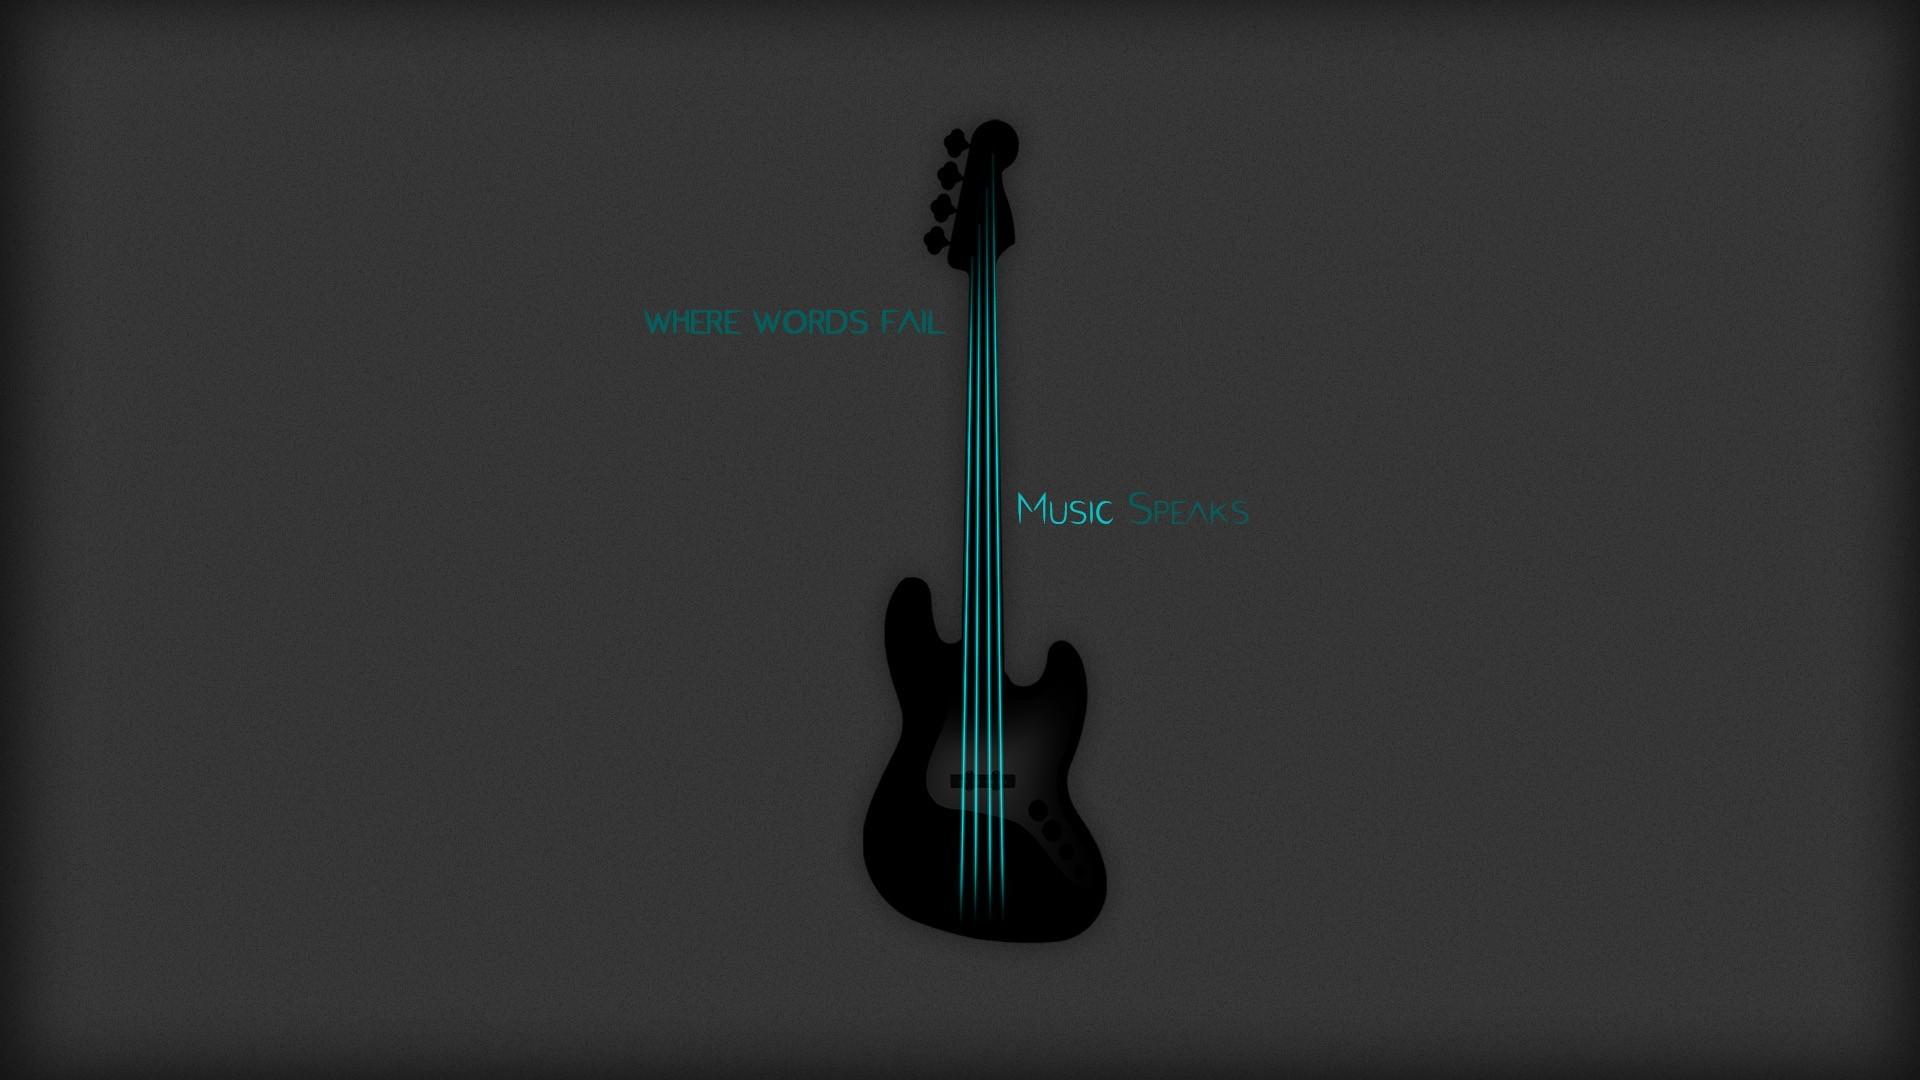 General guitar Hans Christian Anderson music musical instrument  minimalism bass guitars